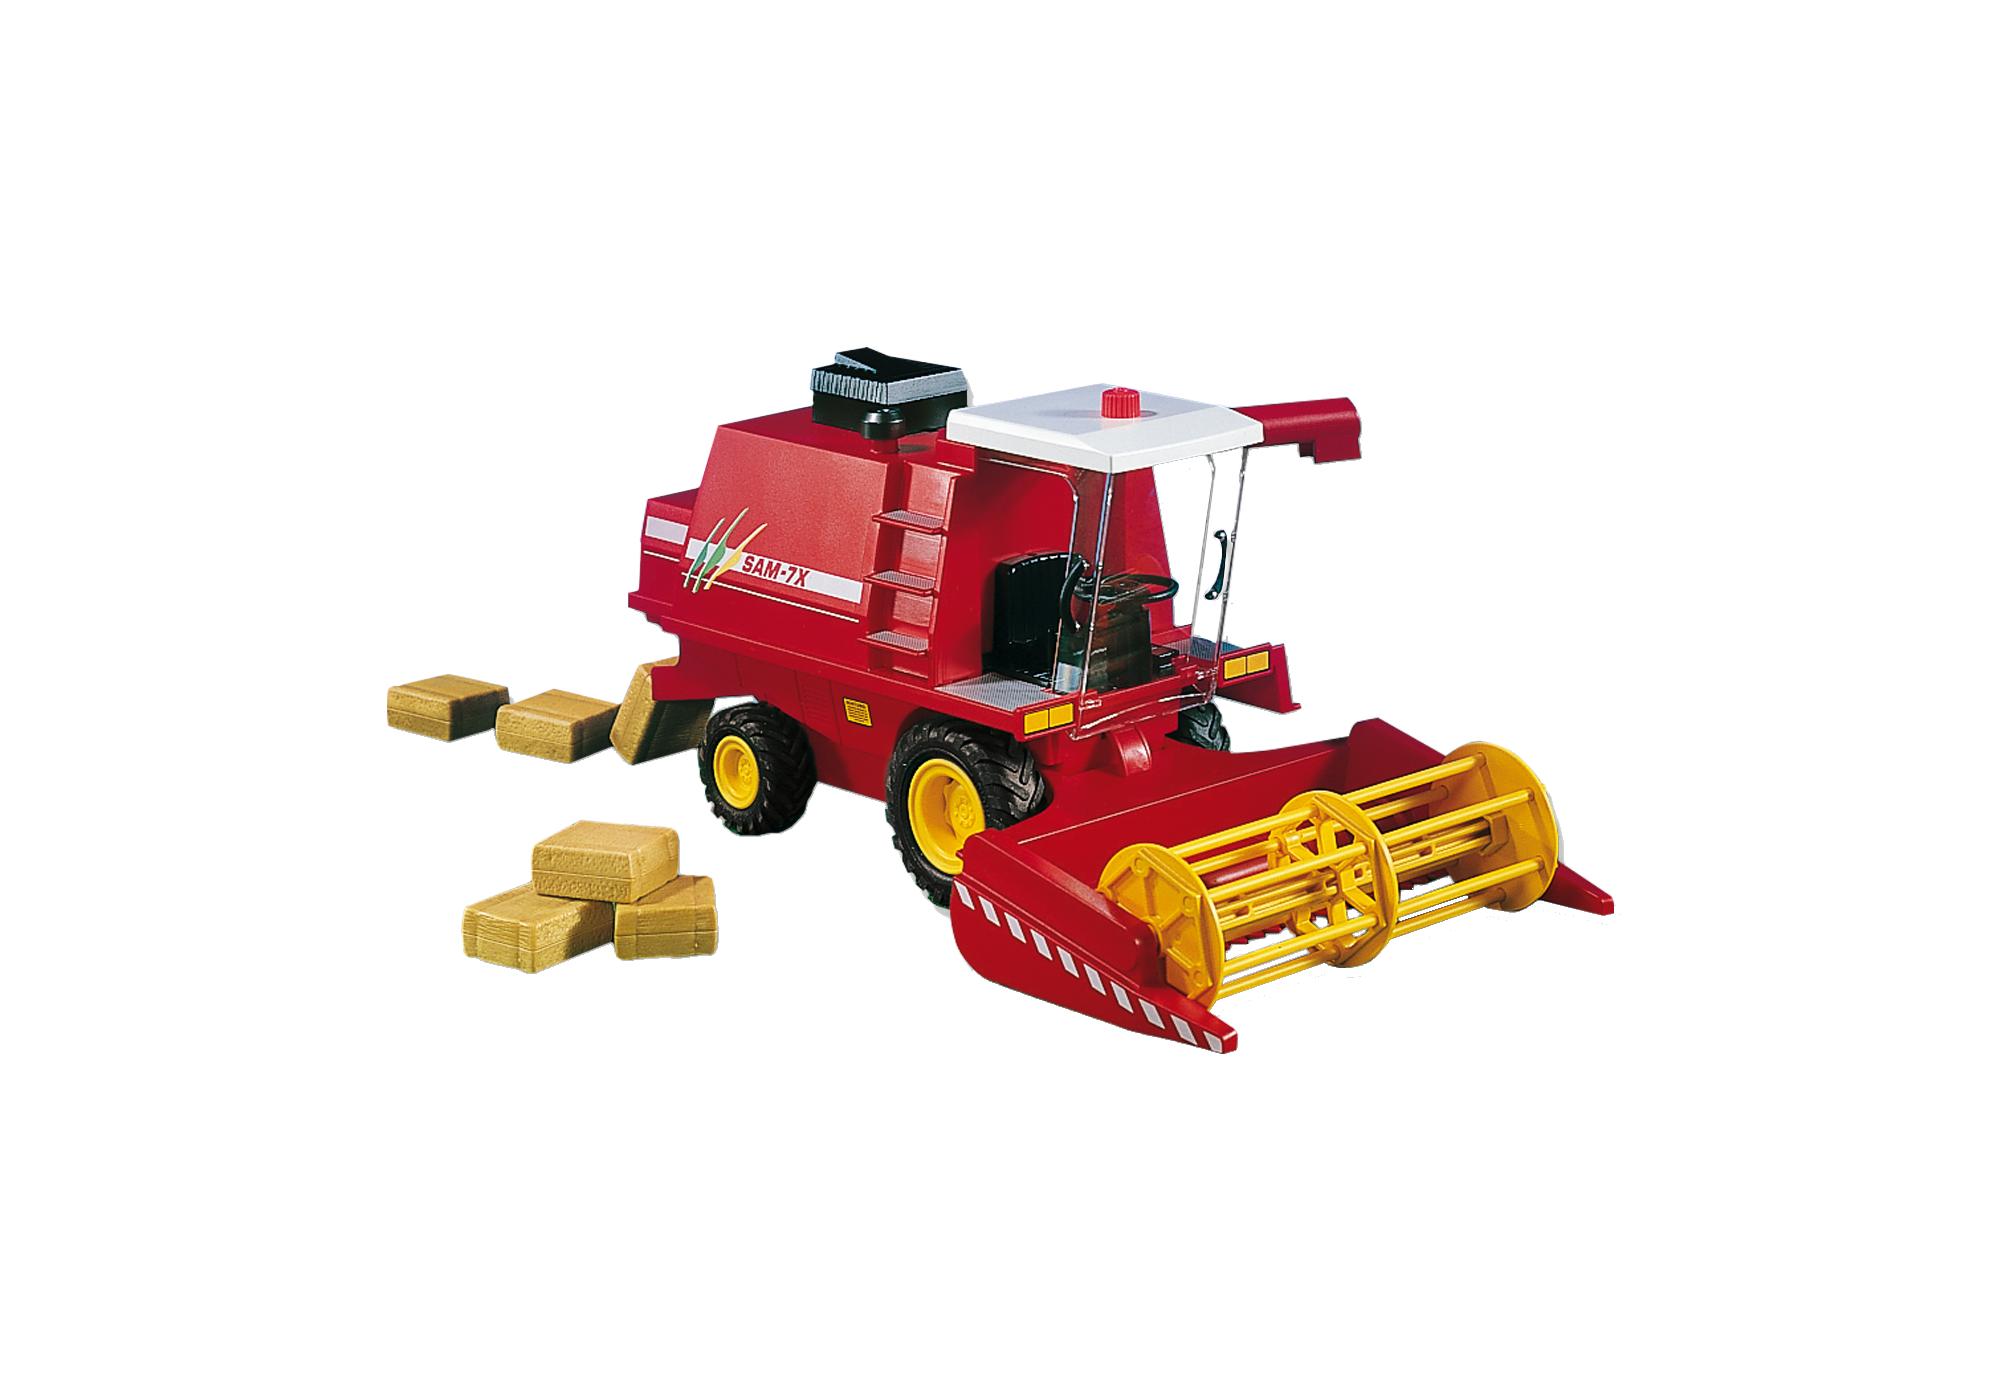 http://media.playmobil.com/i/playmobil/7645_product_detail/Mähdrescher